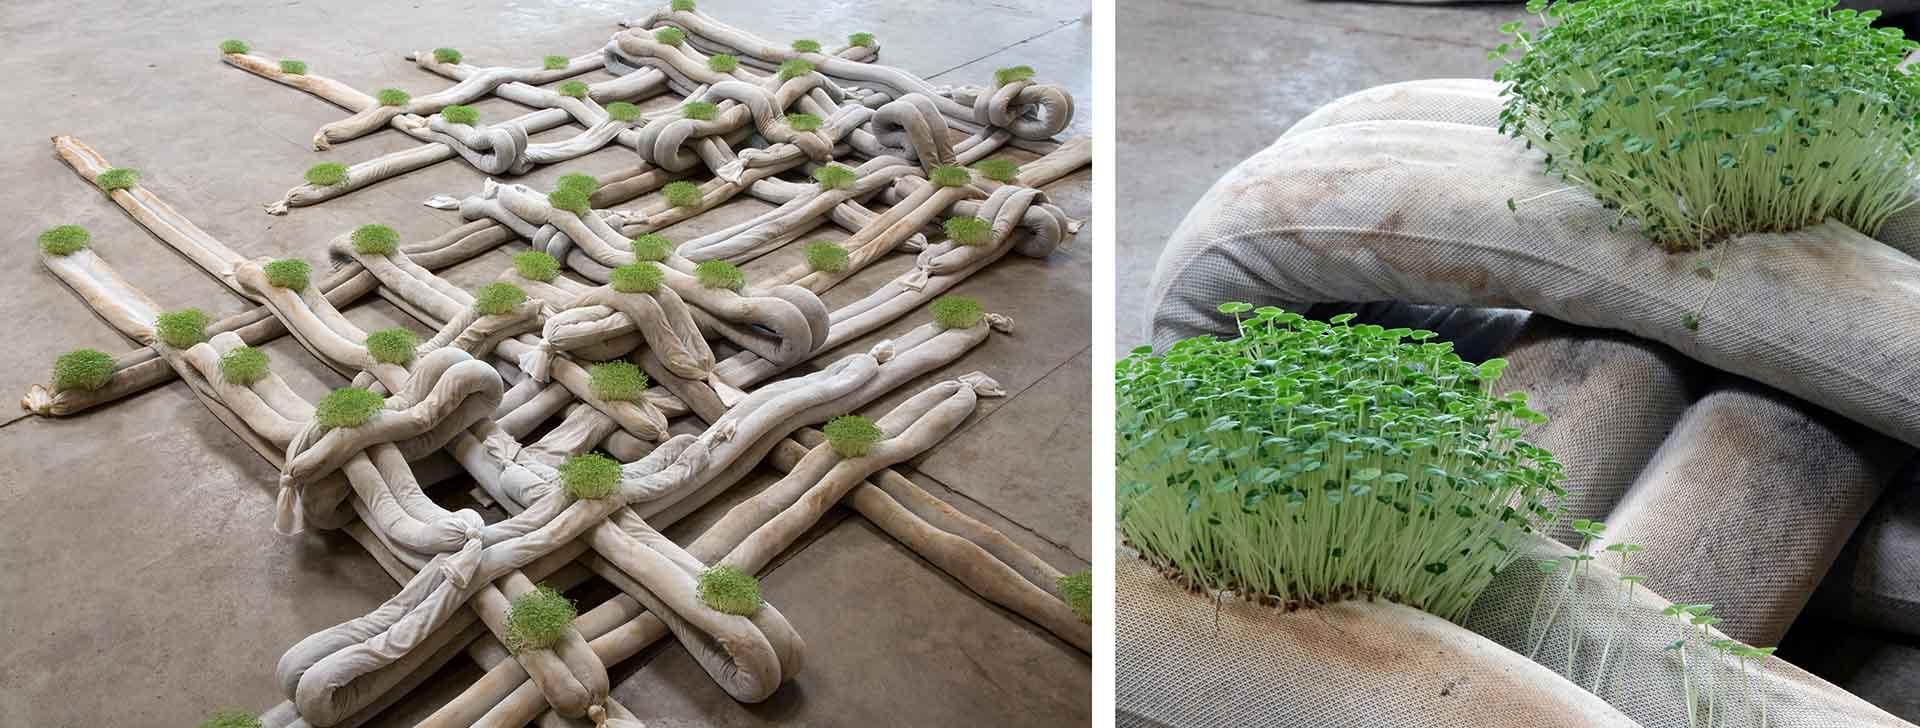 lattice-shaped plant sculpture